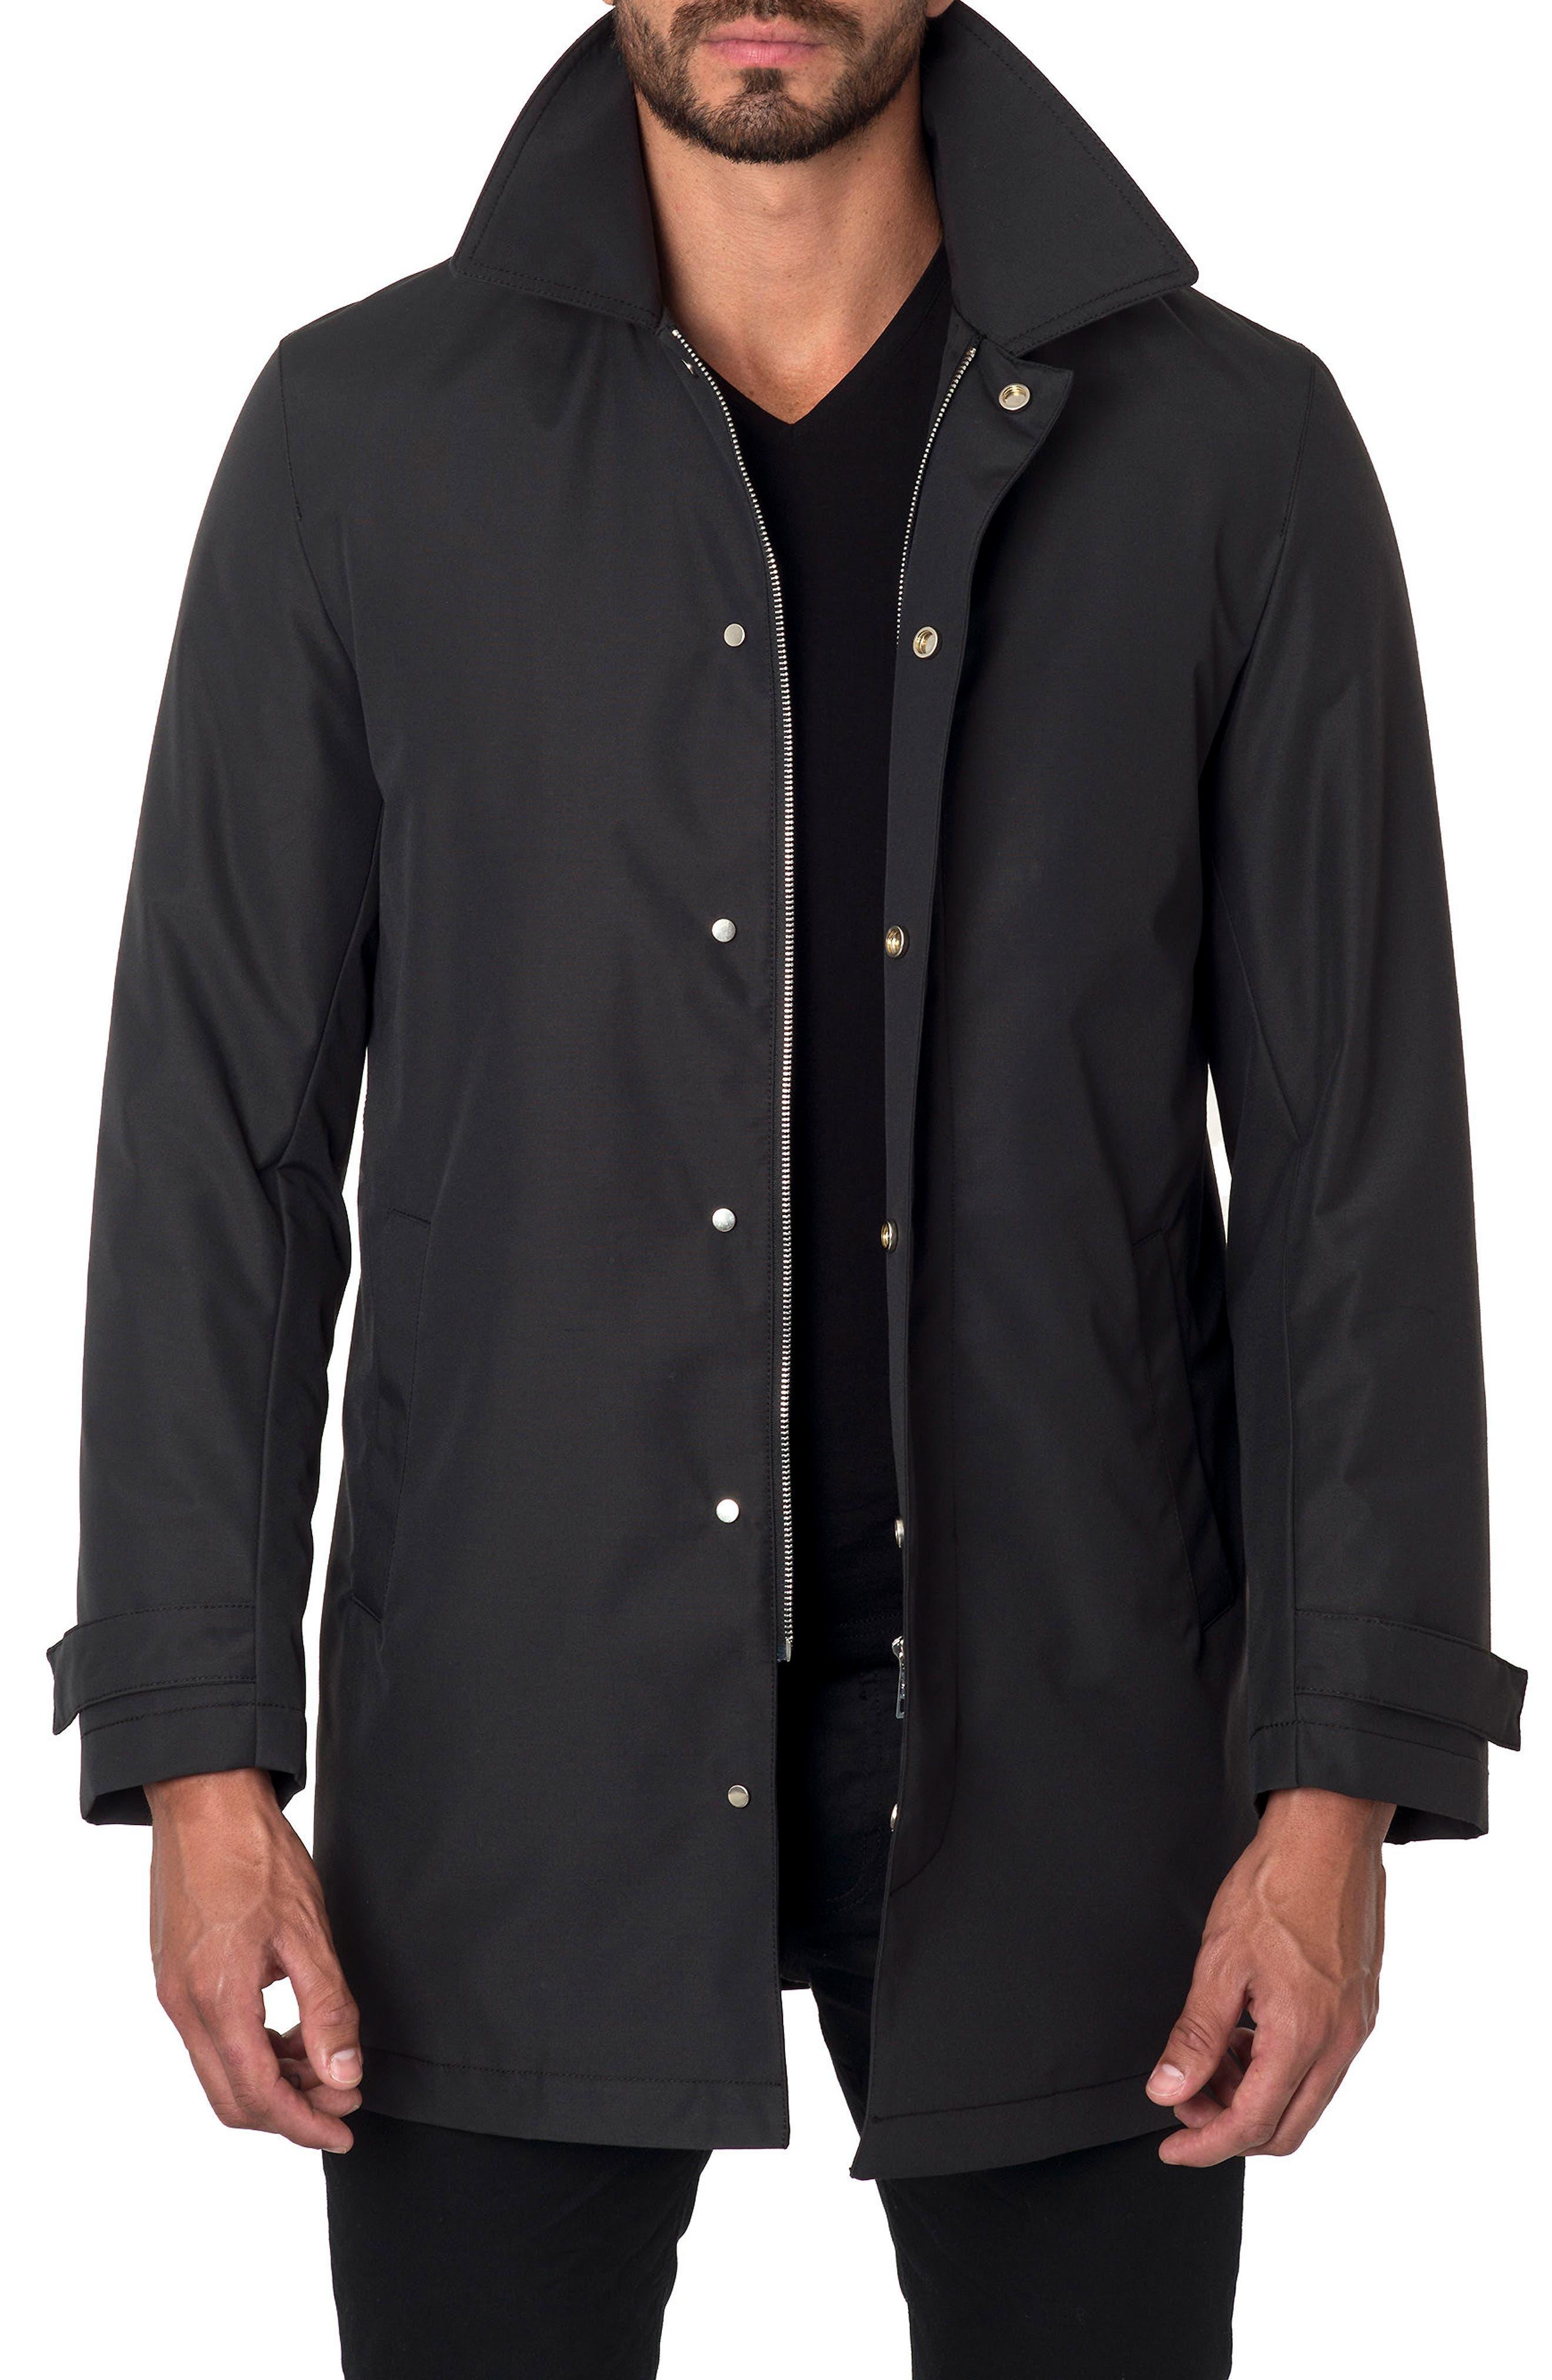 Main Image - Jared Lang Water Repellent Jacket